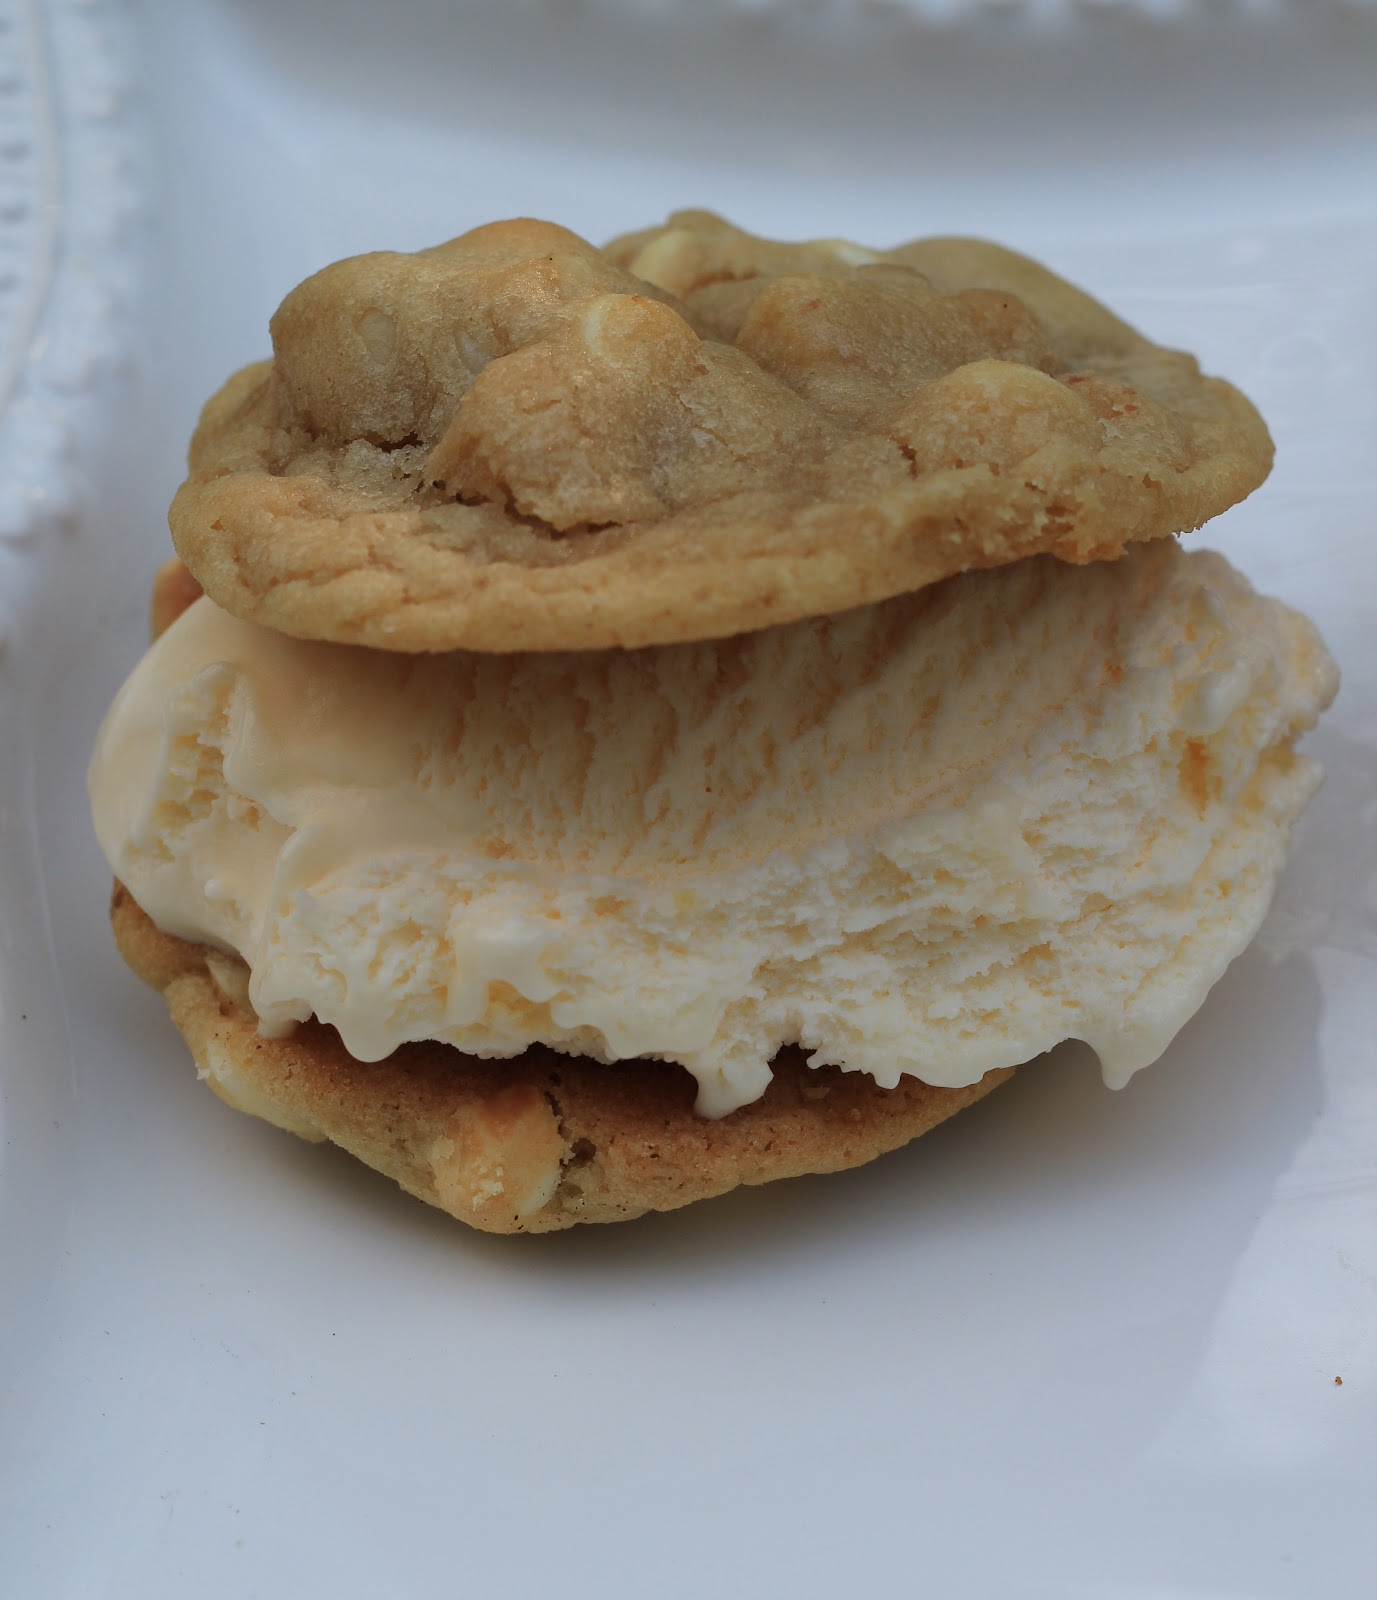 A little cuppa tea ice cream sandwiches for White chocolate macadamia nut ice cream